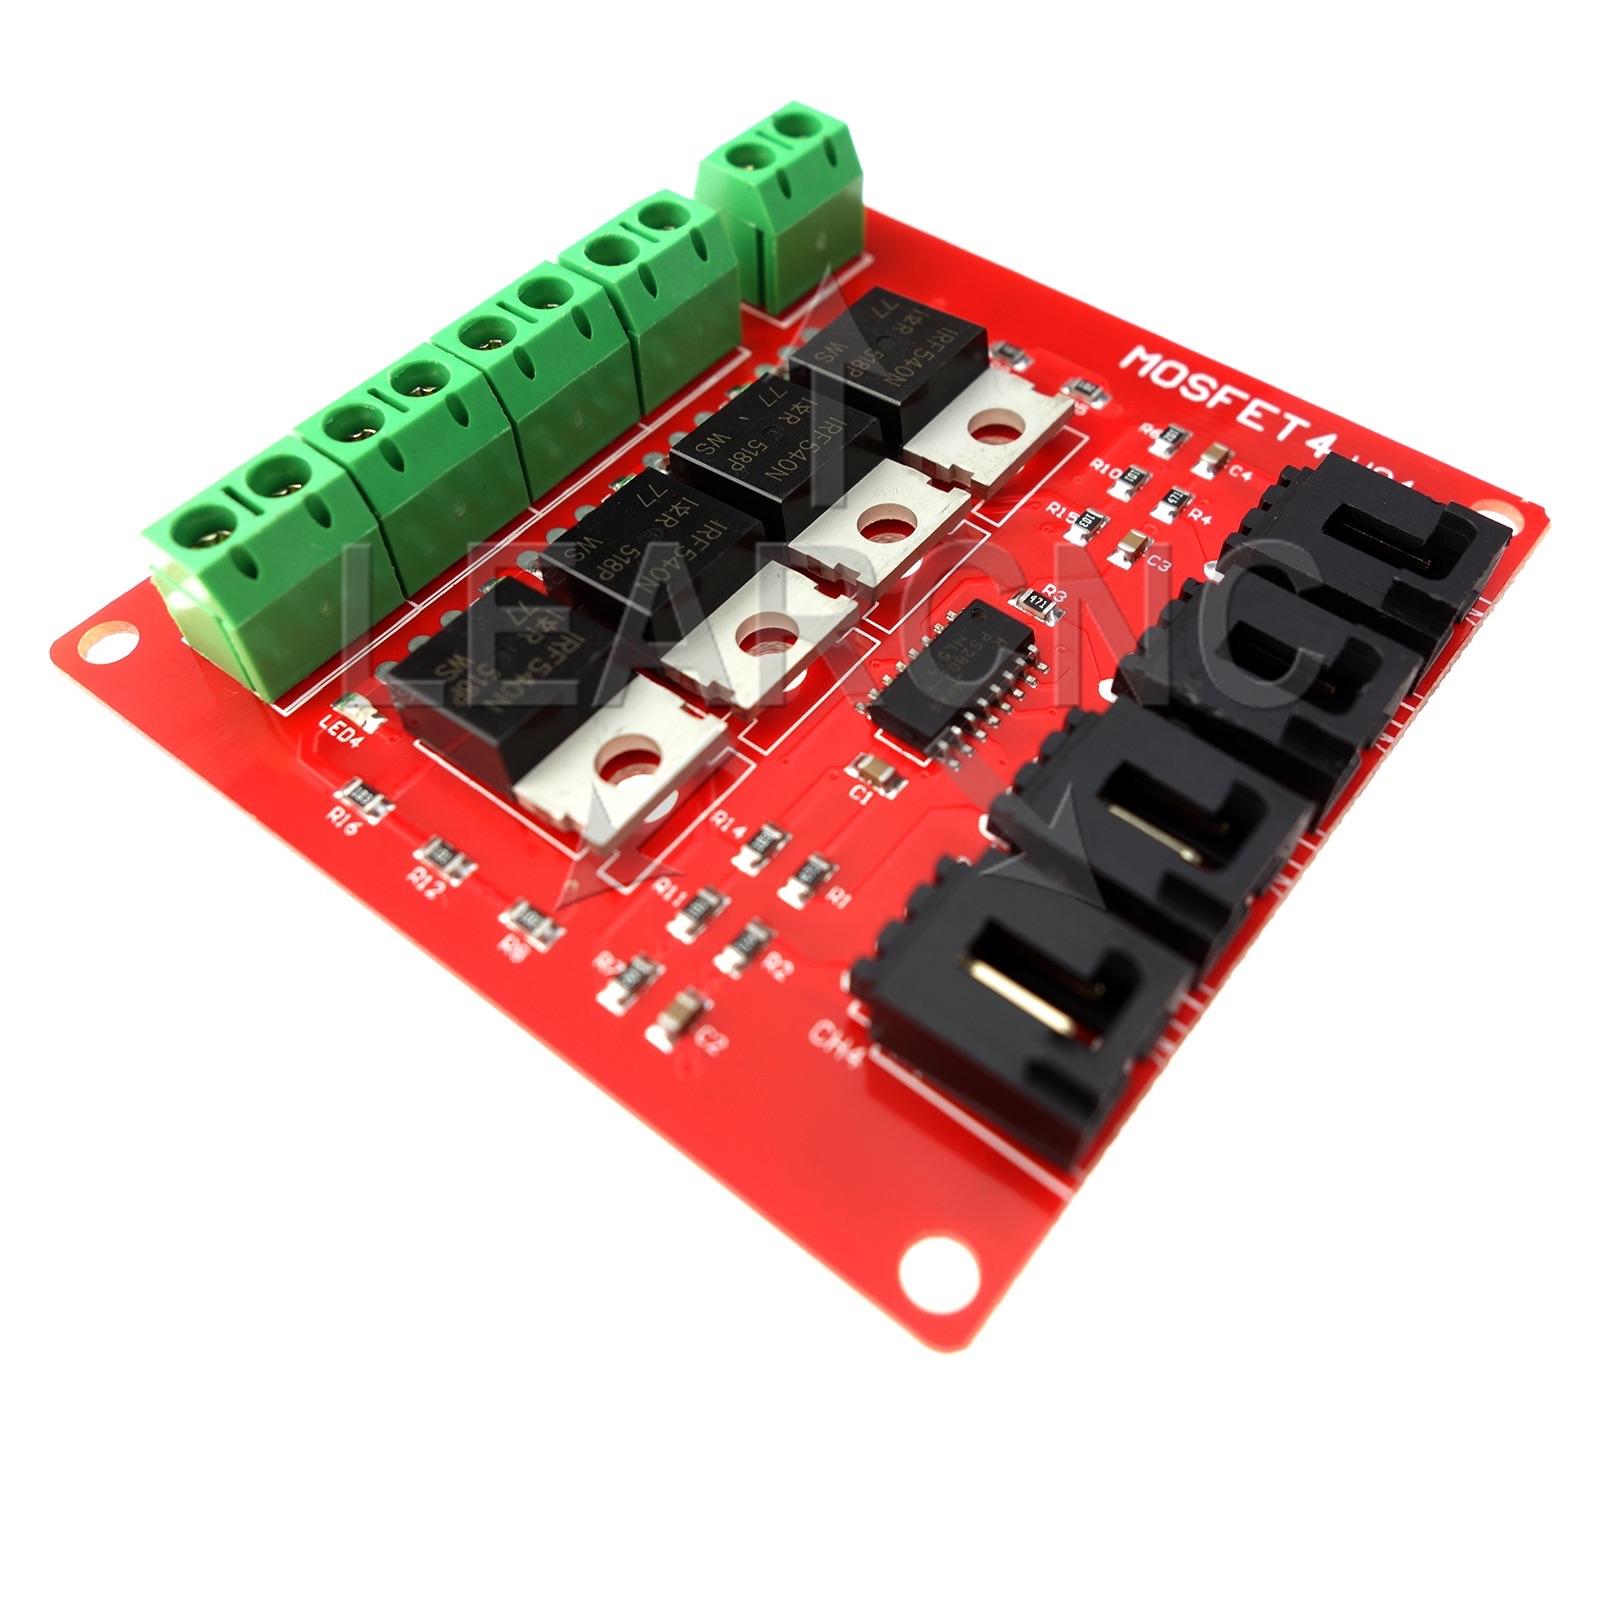 Irf540 Mosfet 4 Port Logic Level Optoisolator Switch